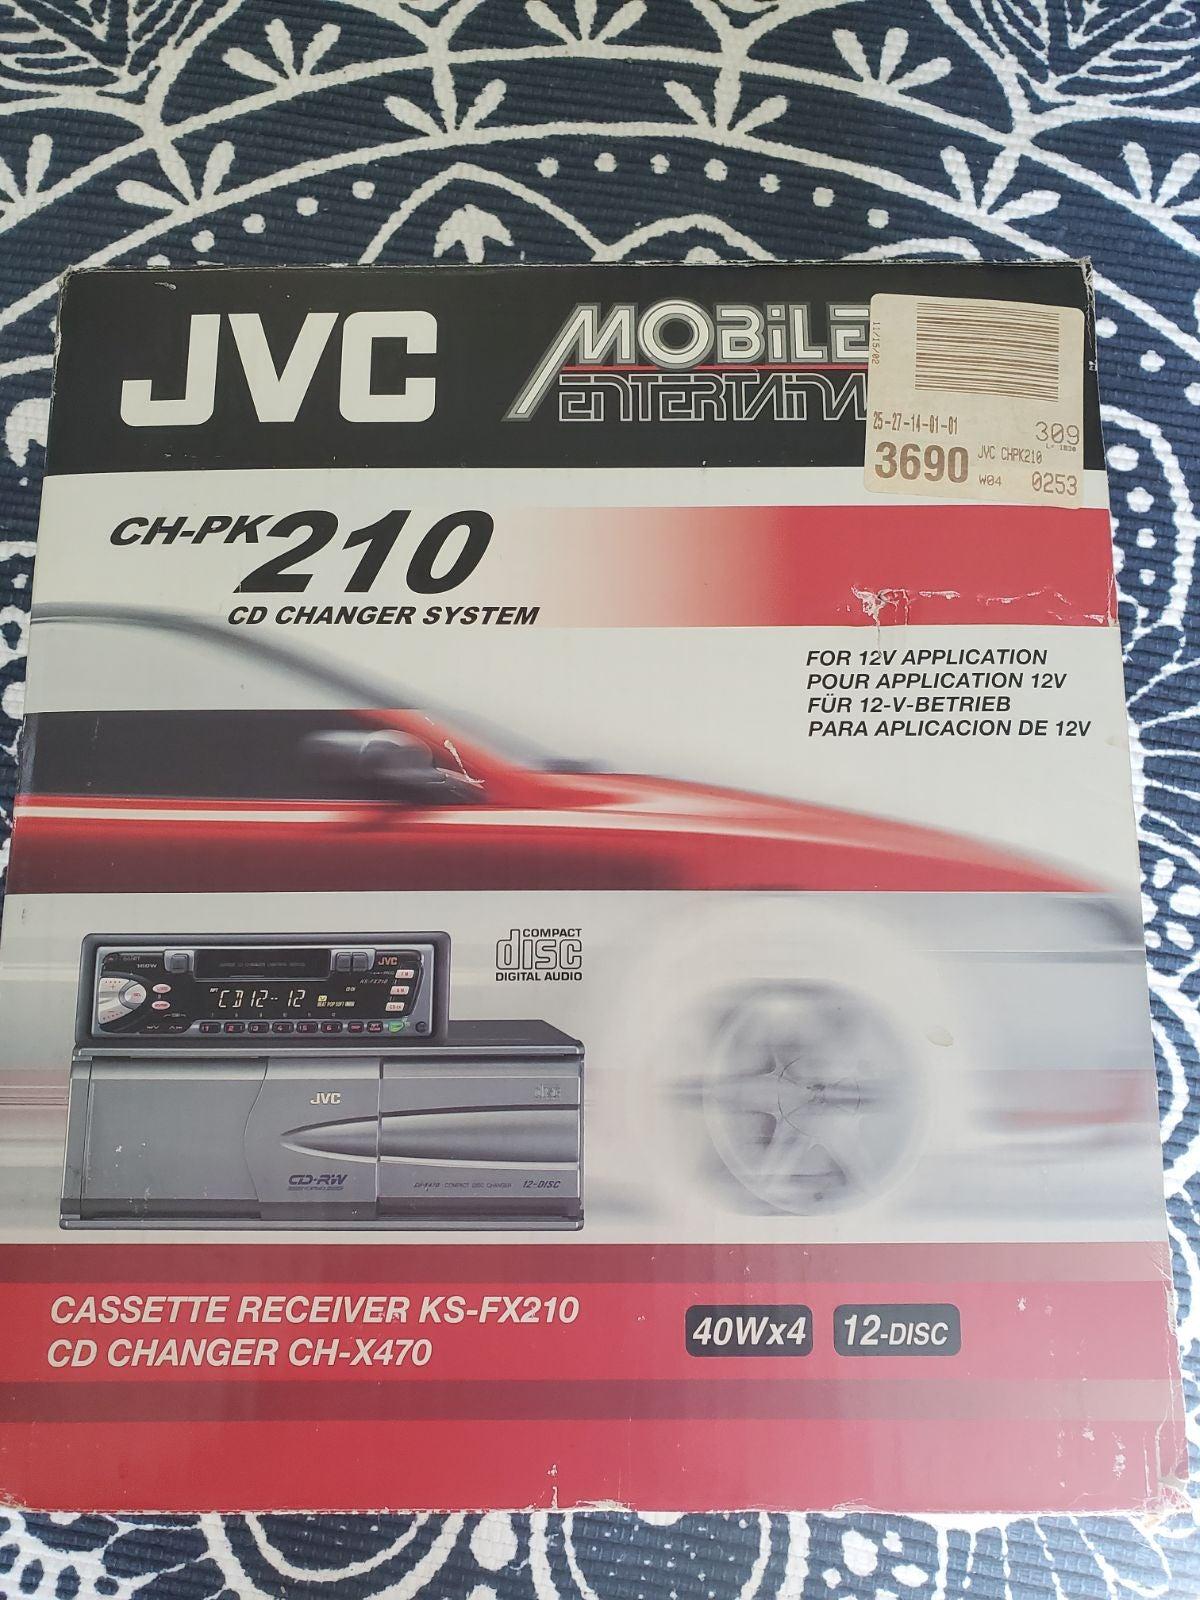 MINT JVC CD Changer System